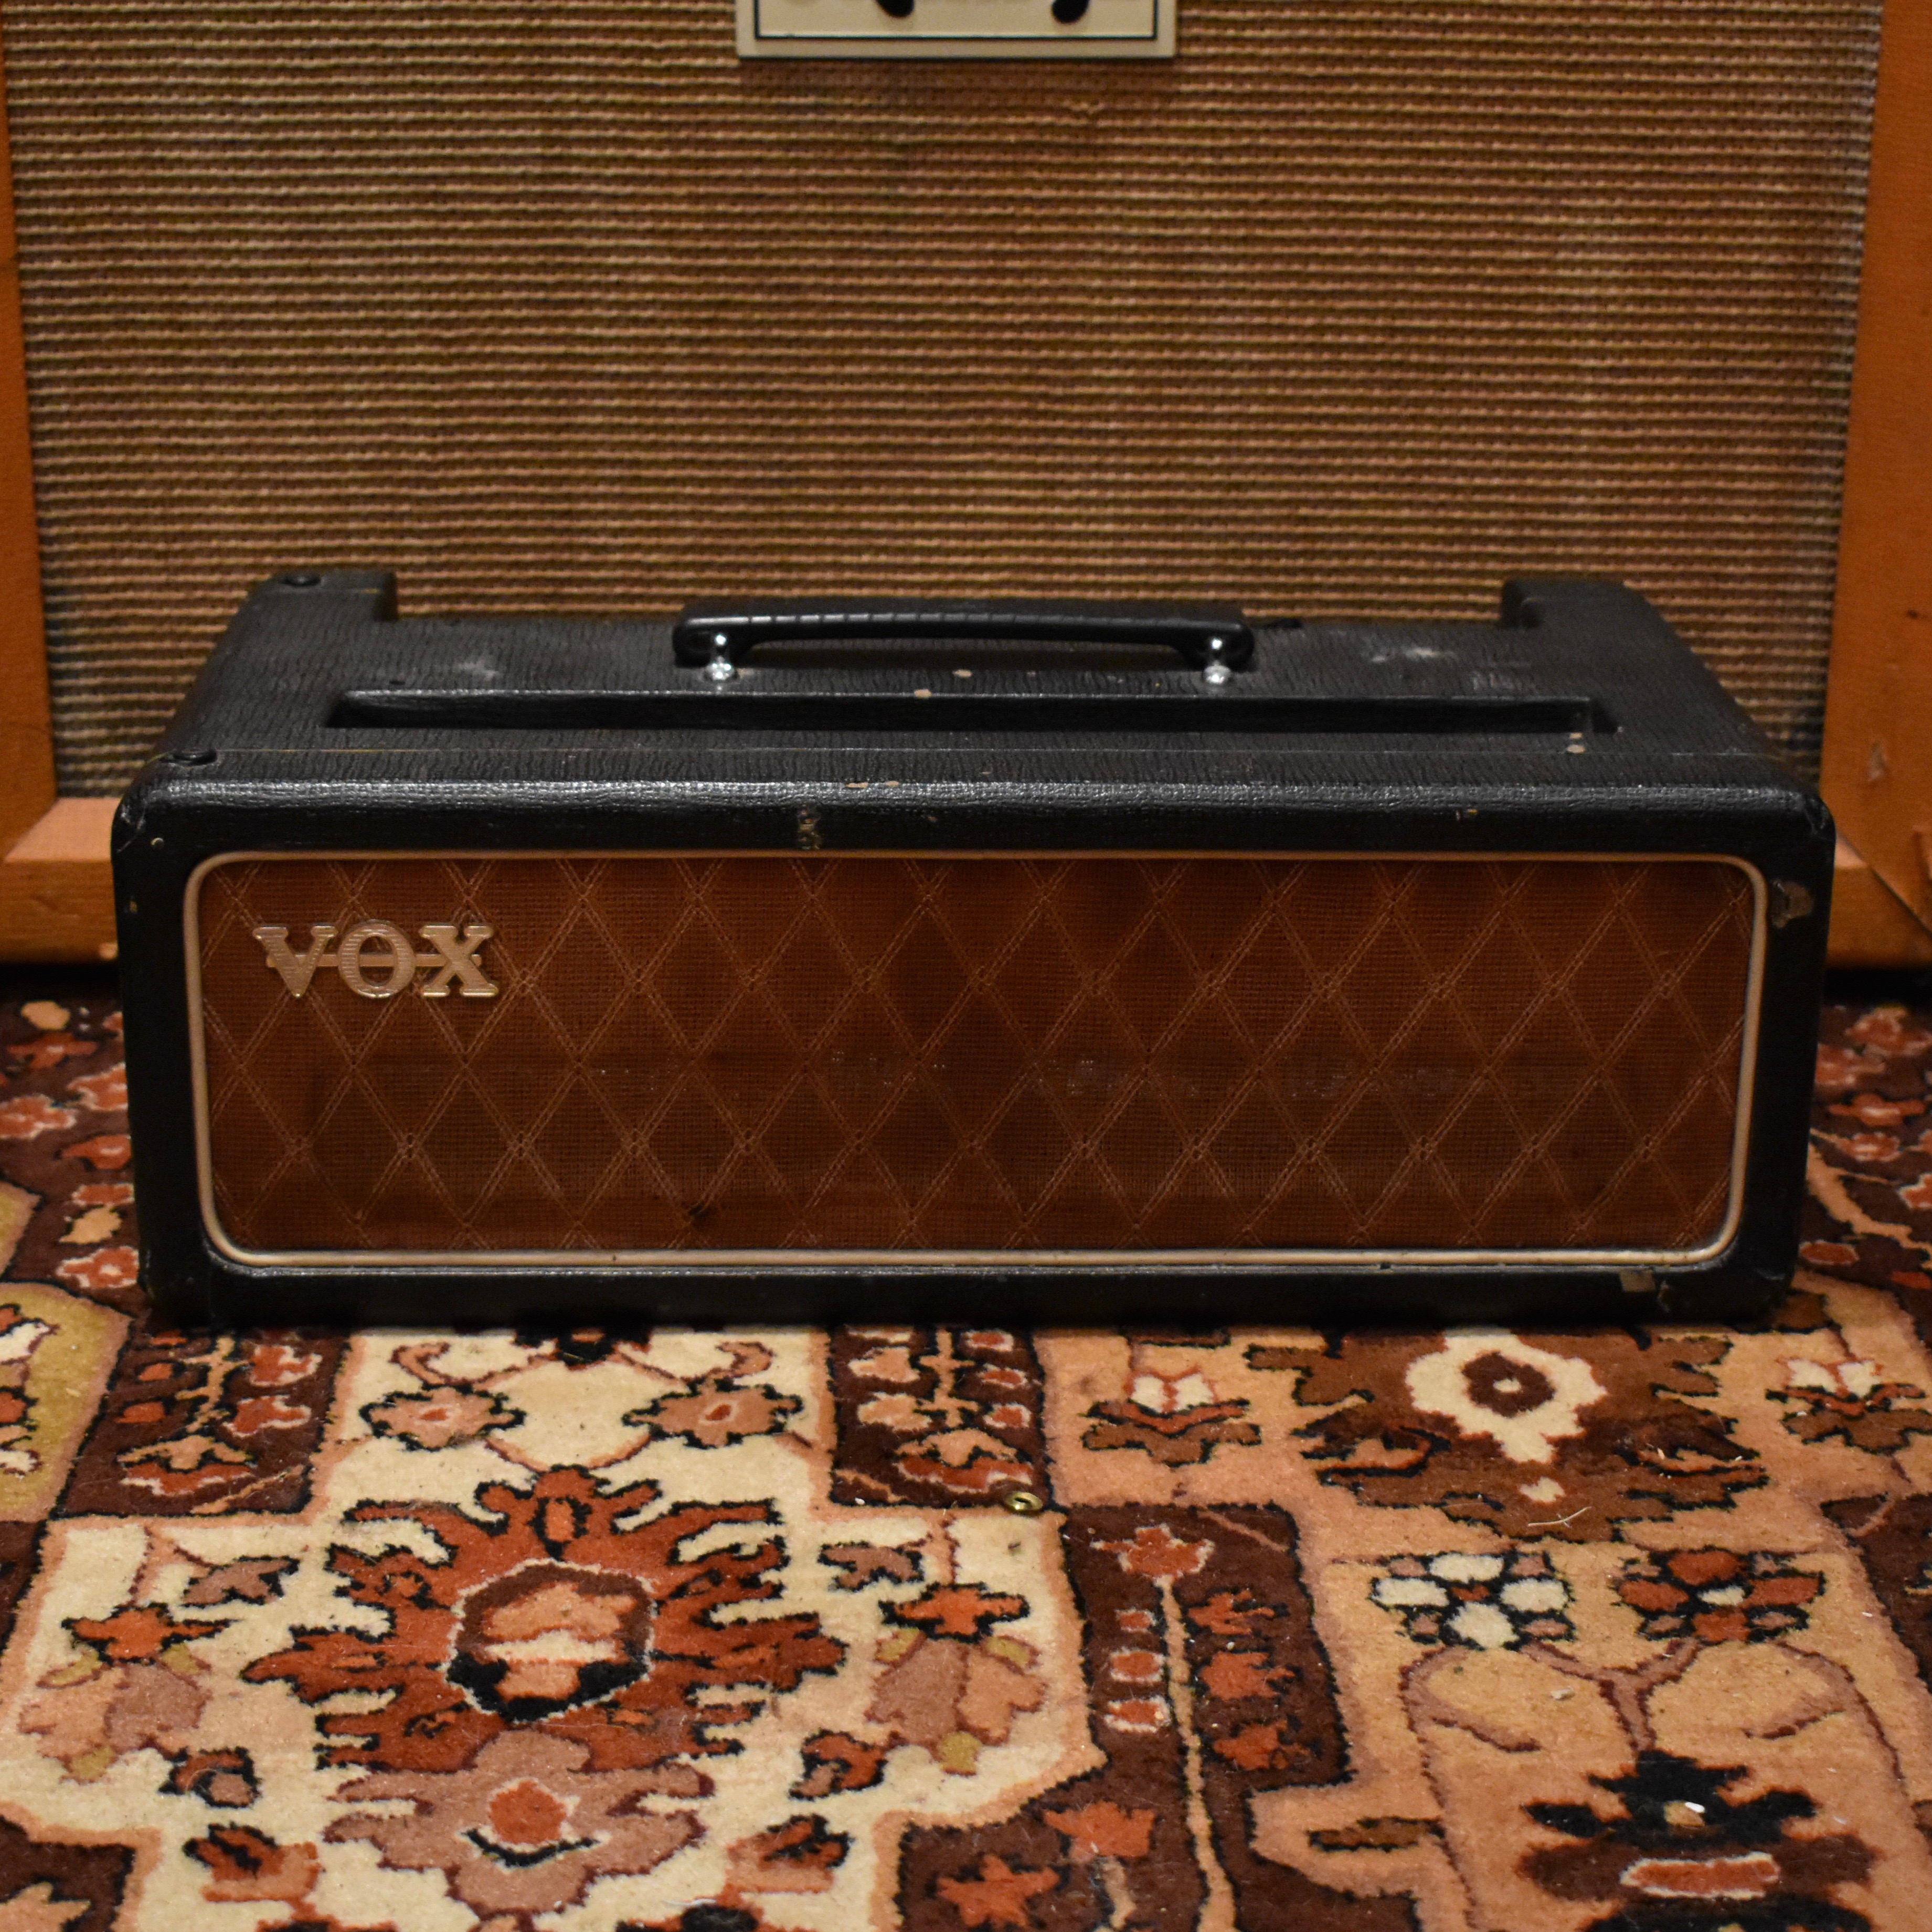 Vintage 1964 Vox JMI AC50 MKII Small Box Valve Amplifier